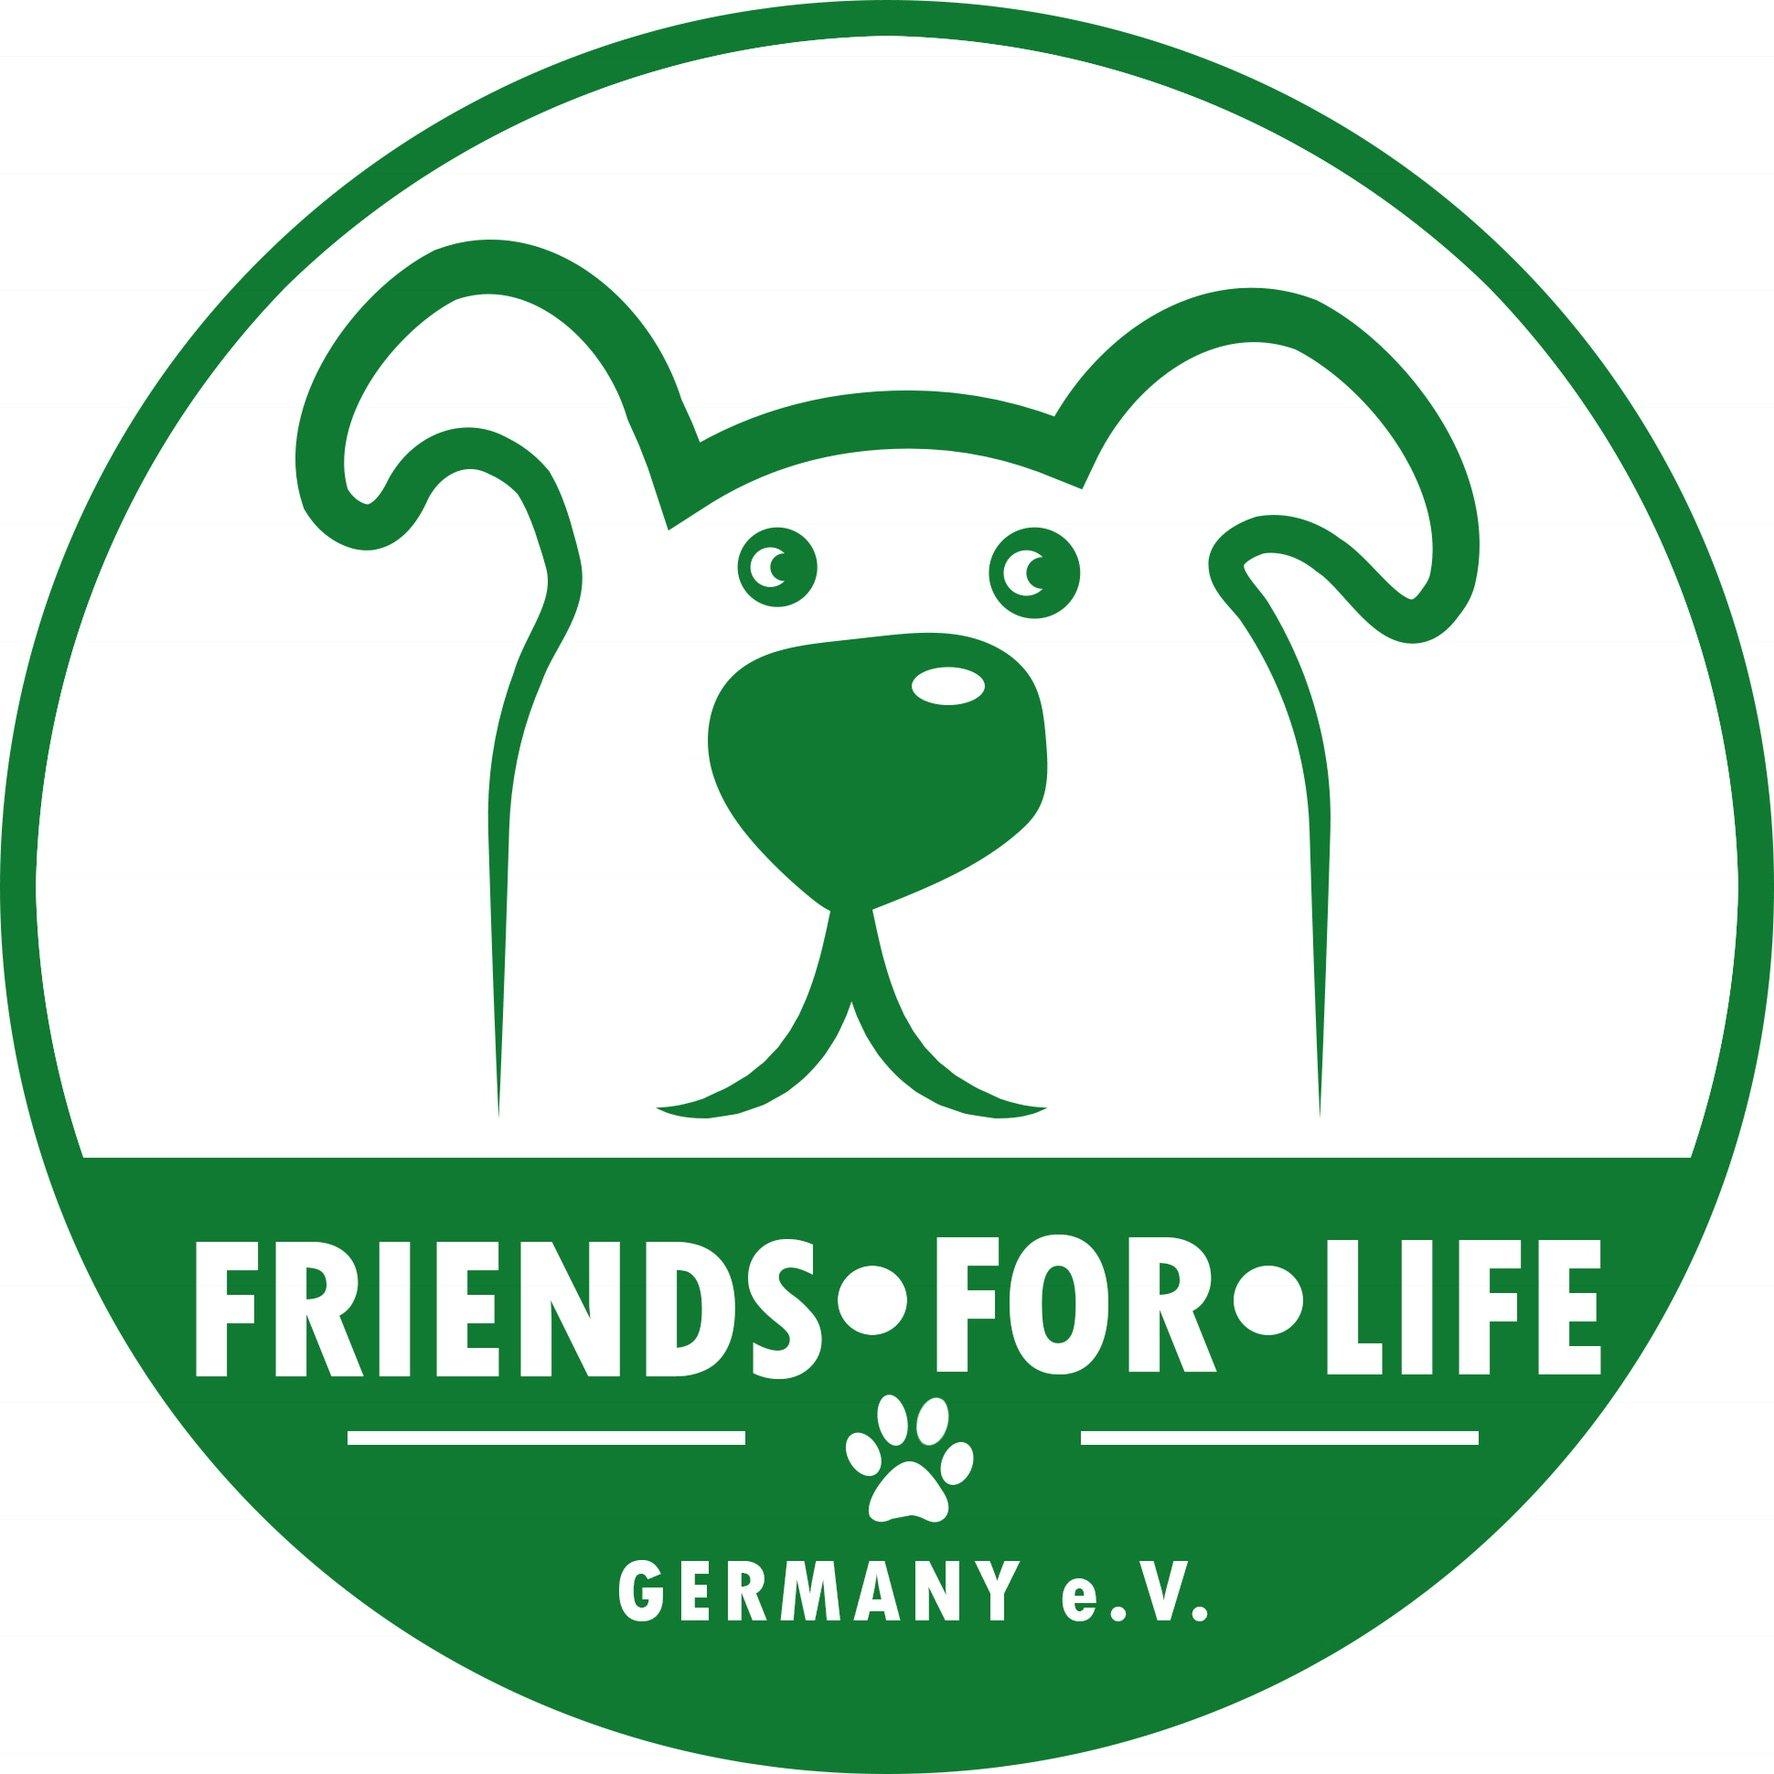 Friends for Life Germany e.V.